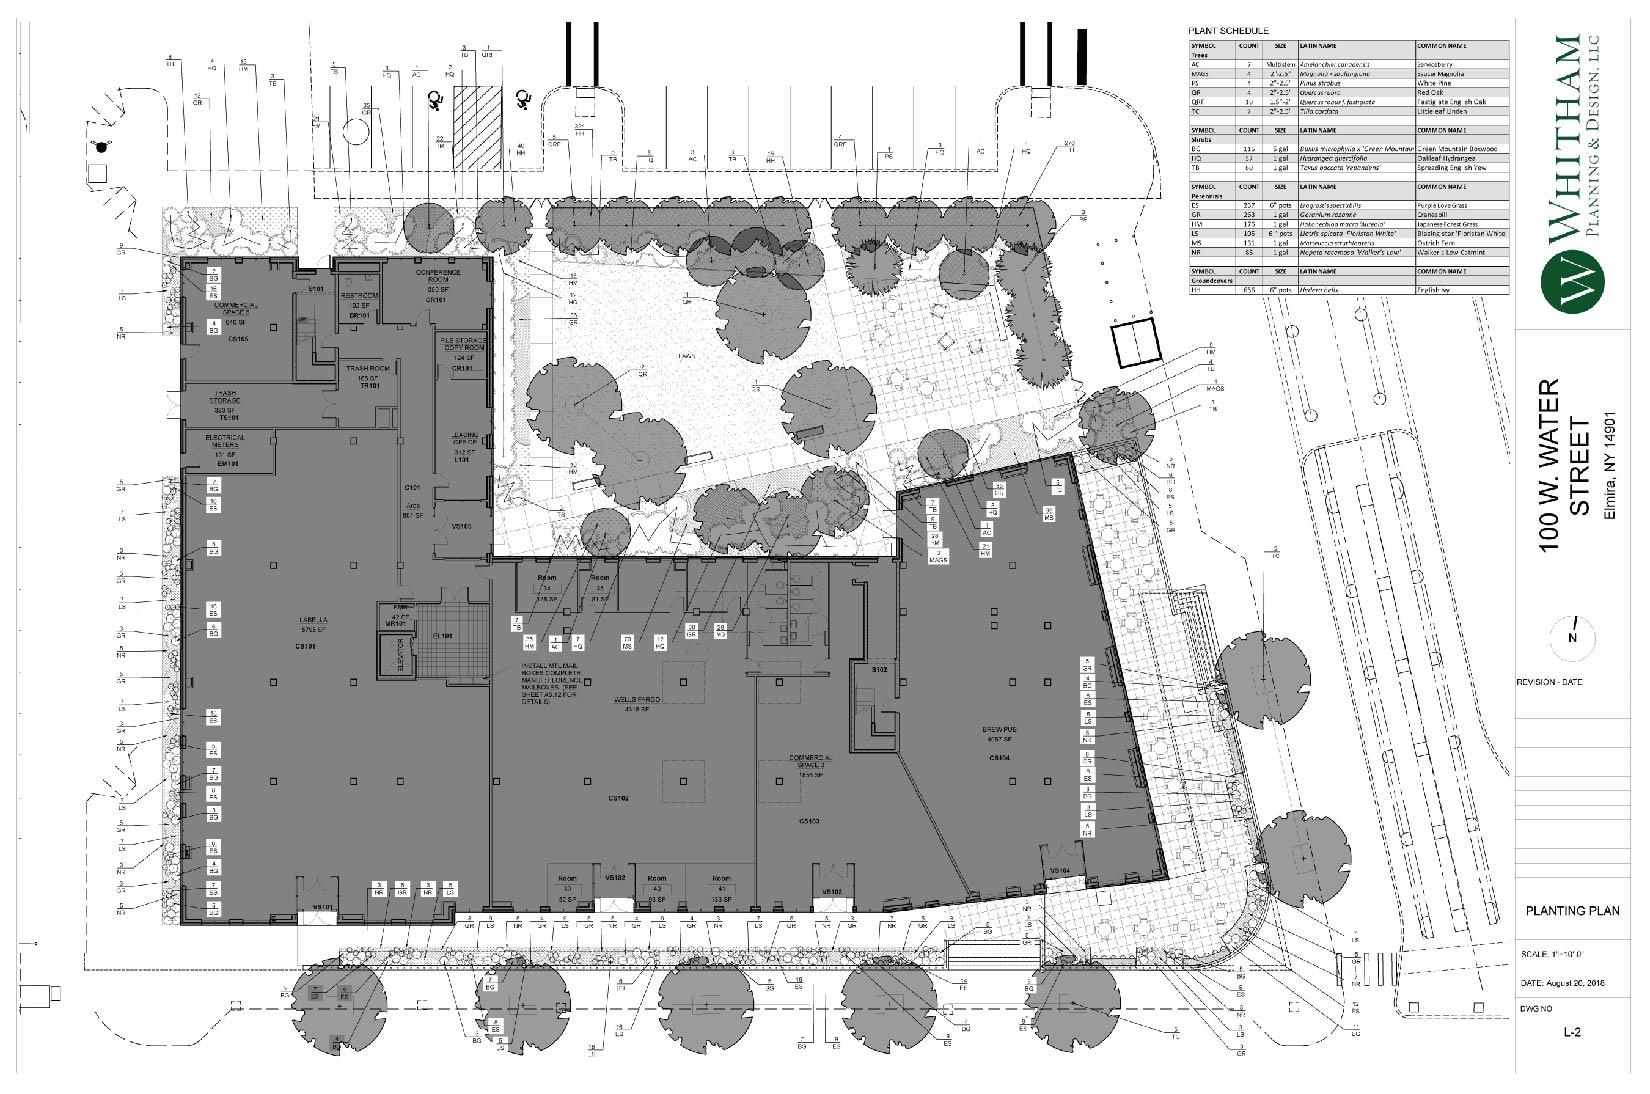 100 W Water planting plan-01-01.jpg